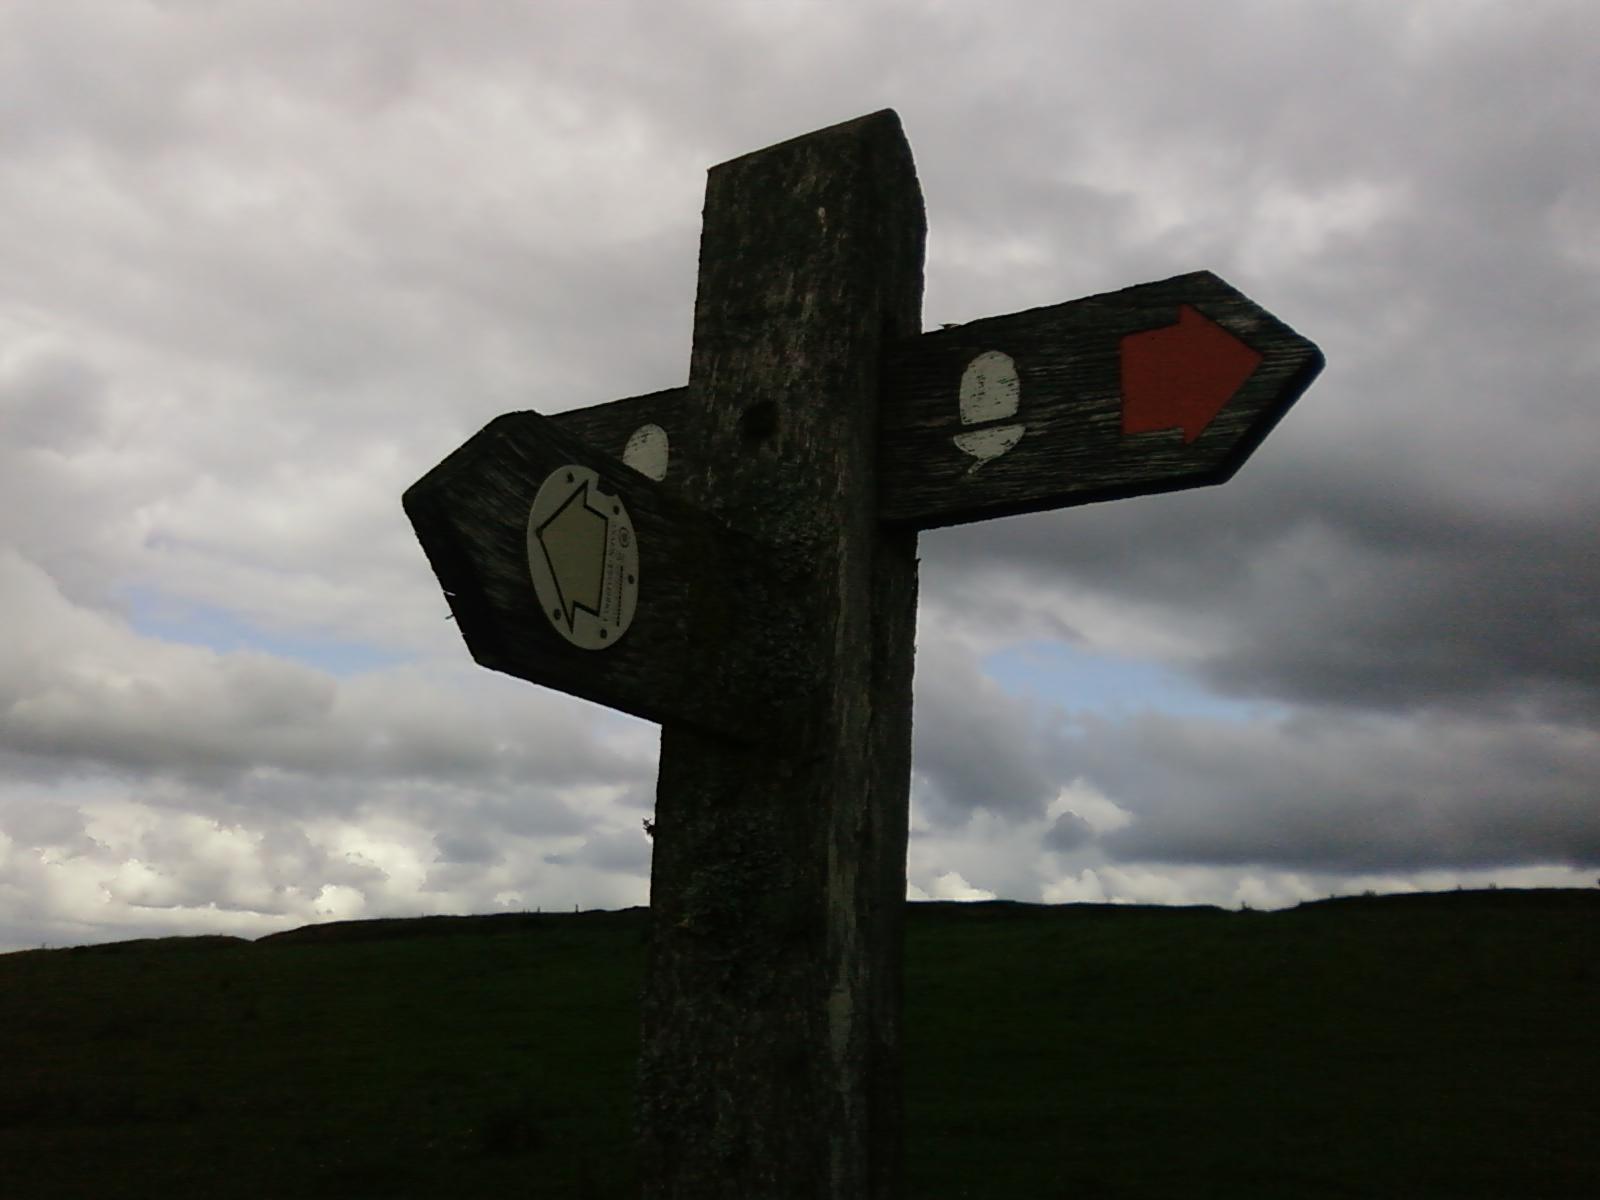 [signpost]